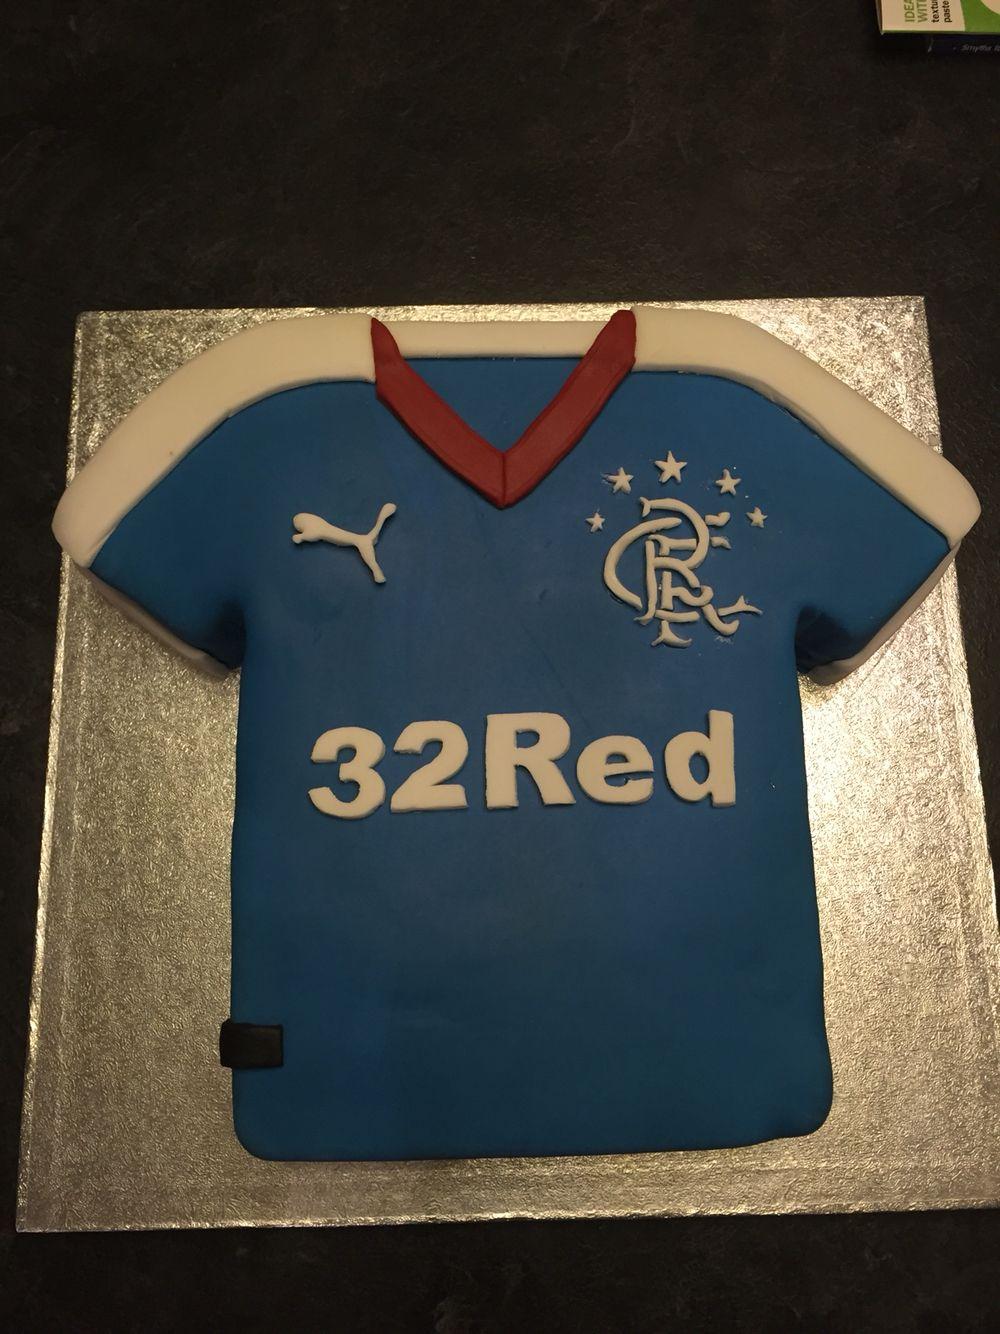 Football Club T Shirts - Cotswold Hire 4c5f08244